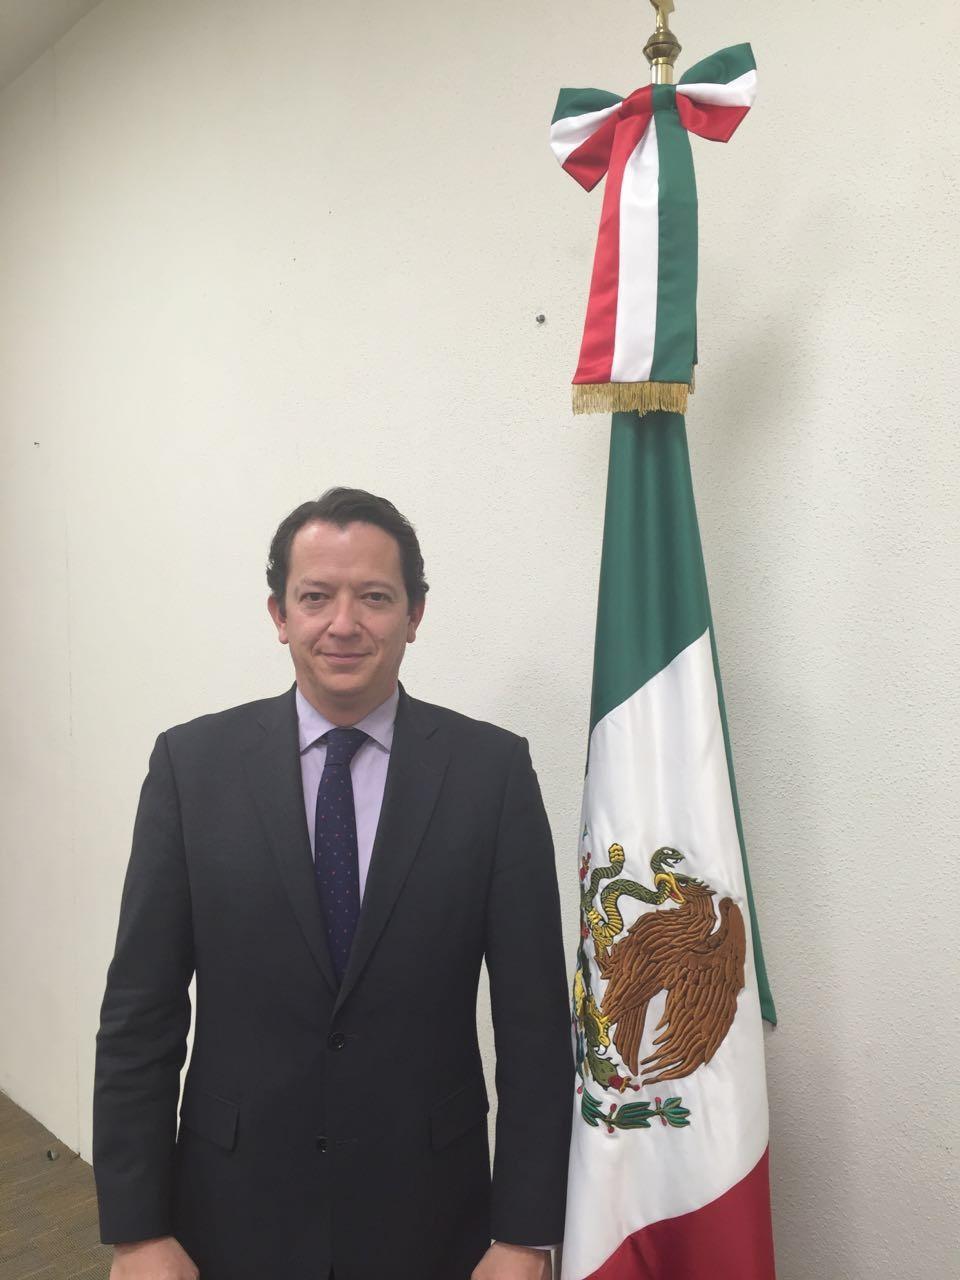 Juan Carlos Lara Armientajpg